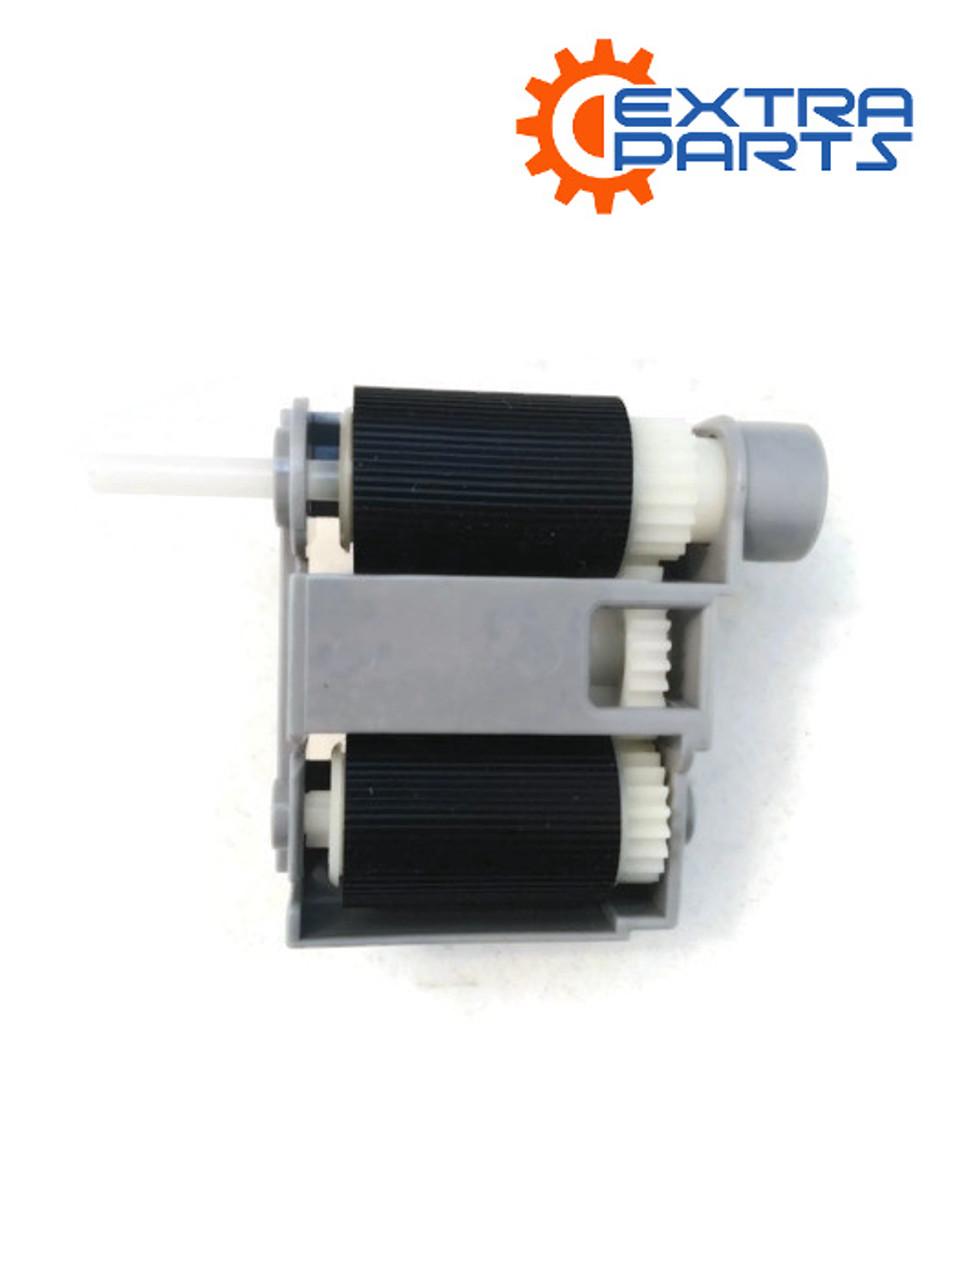 Brother hl-4040cn 4050cdn 4070cdw laser printer reference manual.